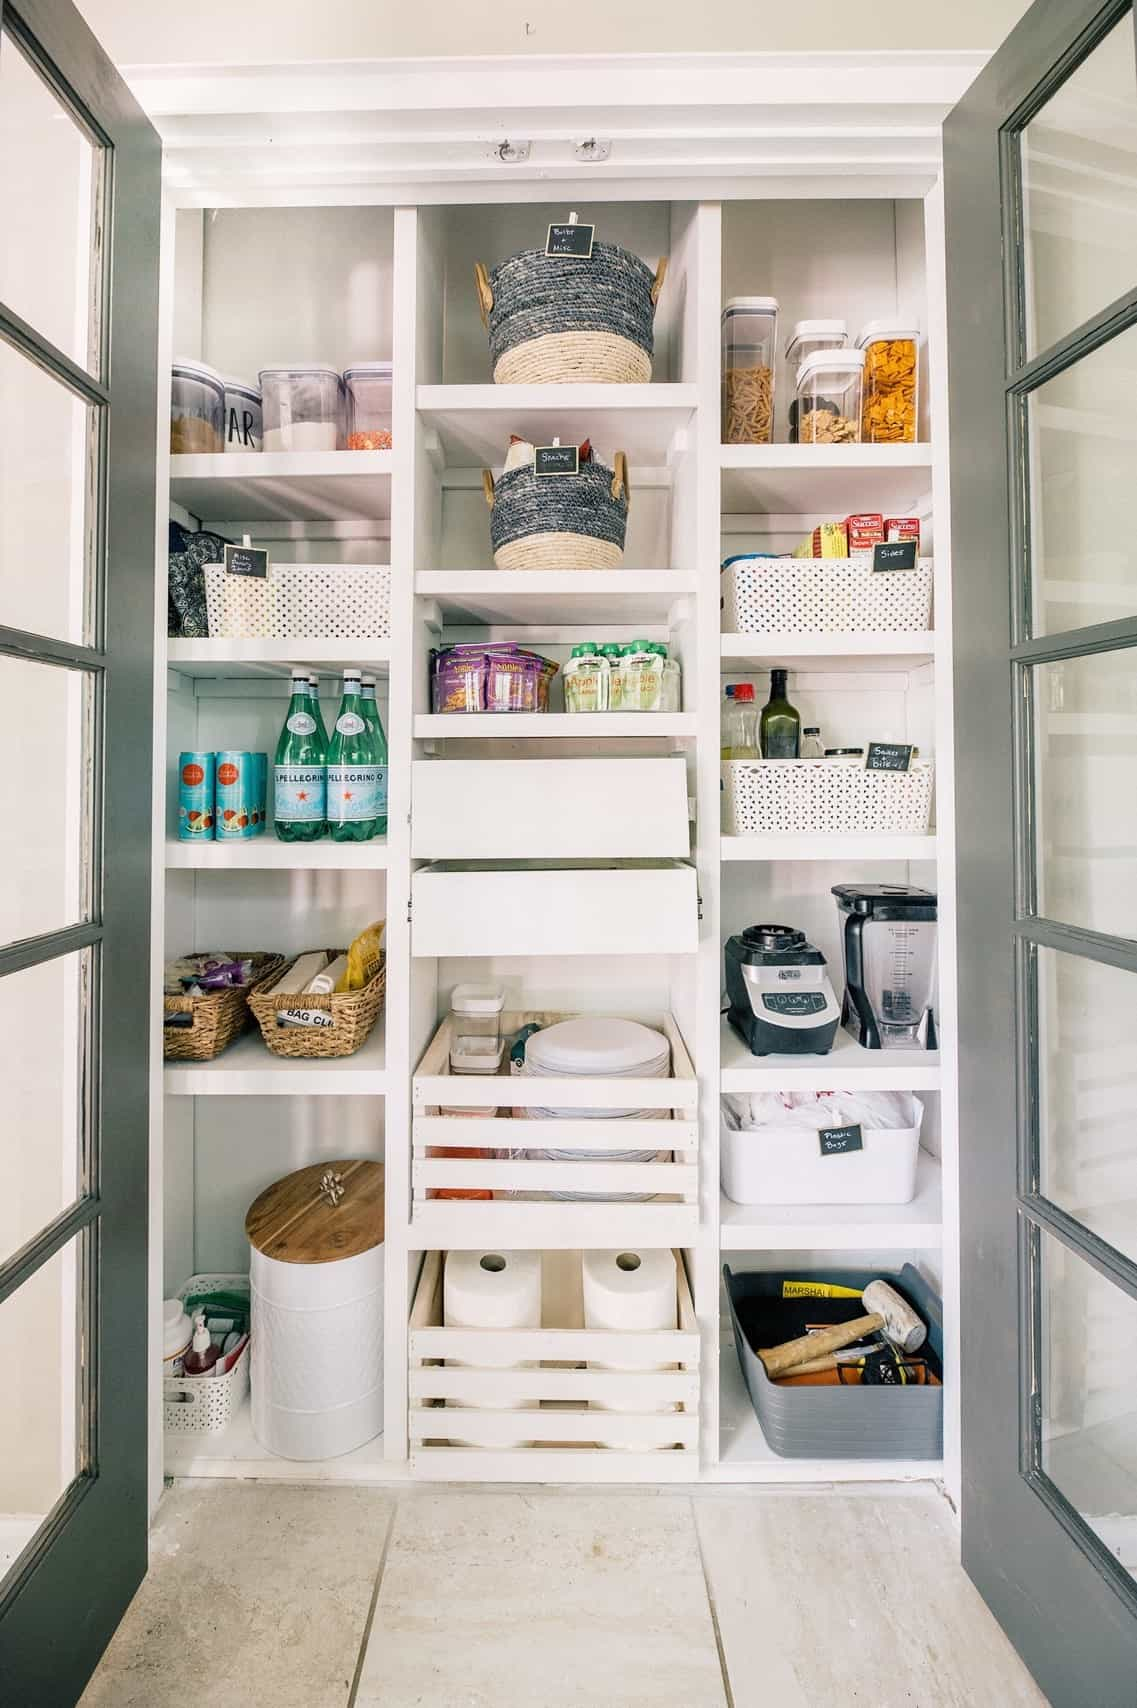 The ultimate custom pantry